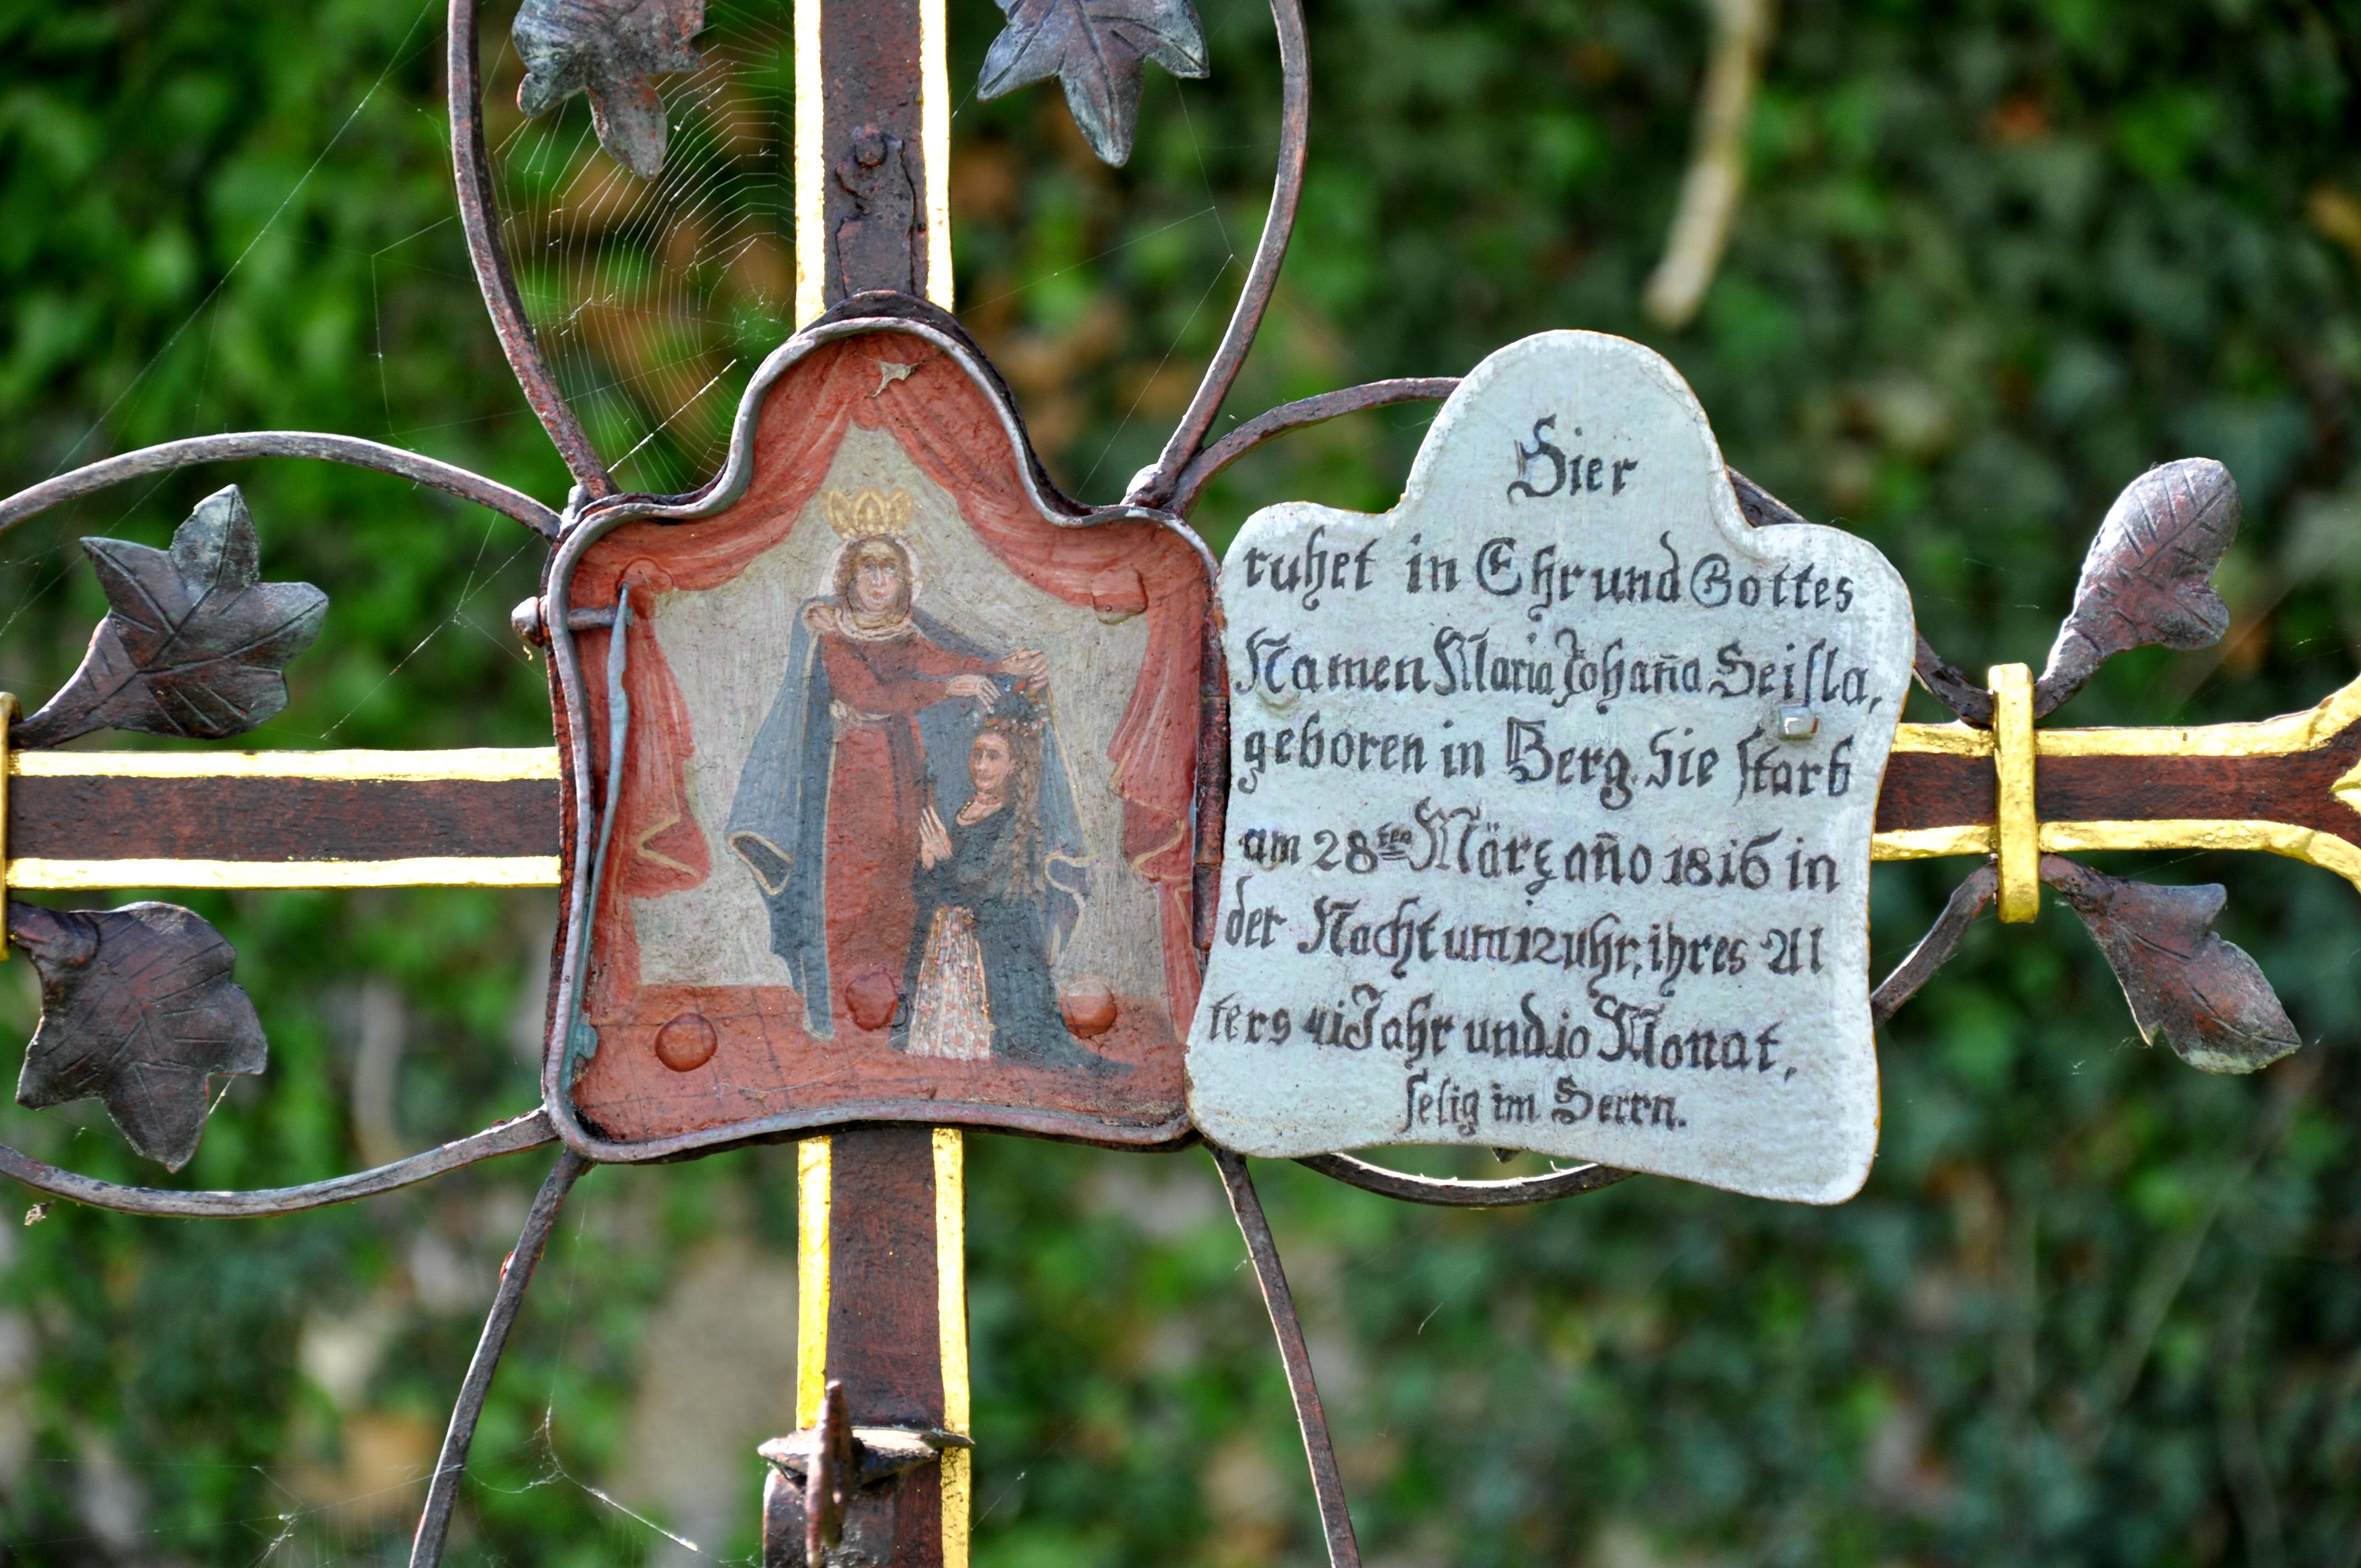 Bestandberg Alter Friedhof 04 Detailjpg Wikipedia